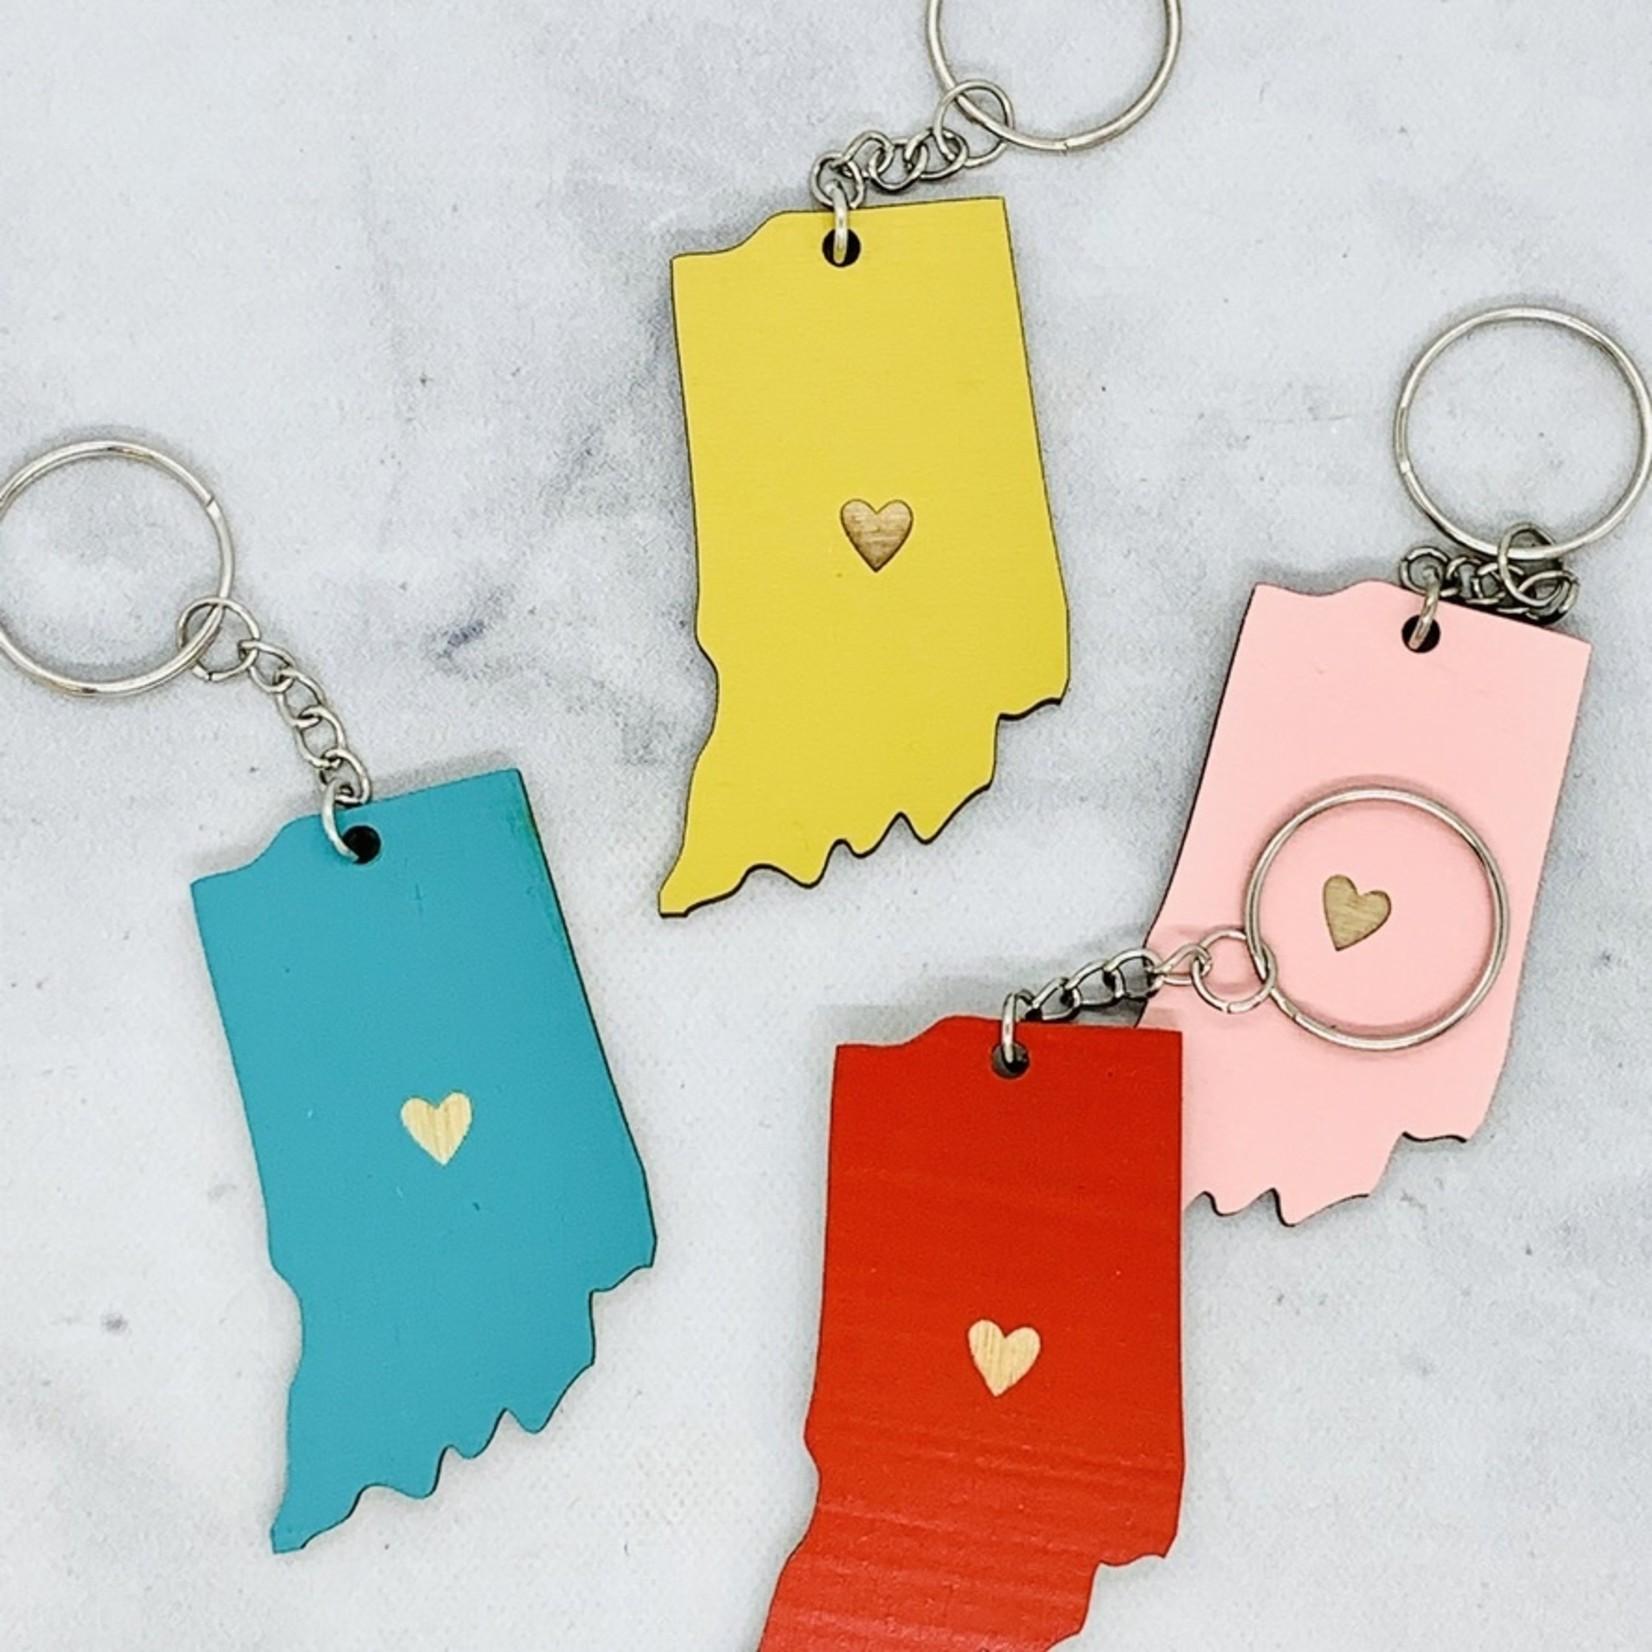 Indiana Heart Keychain